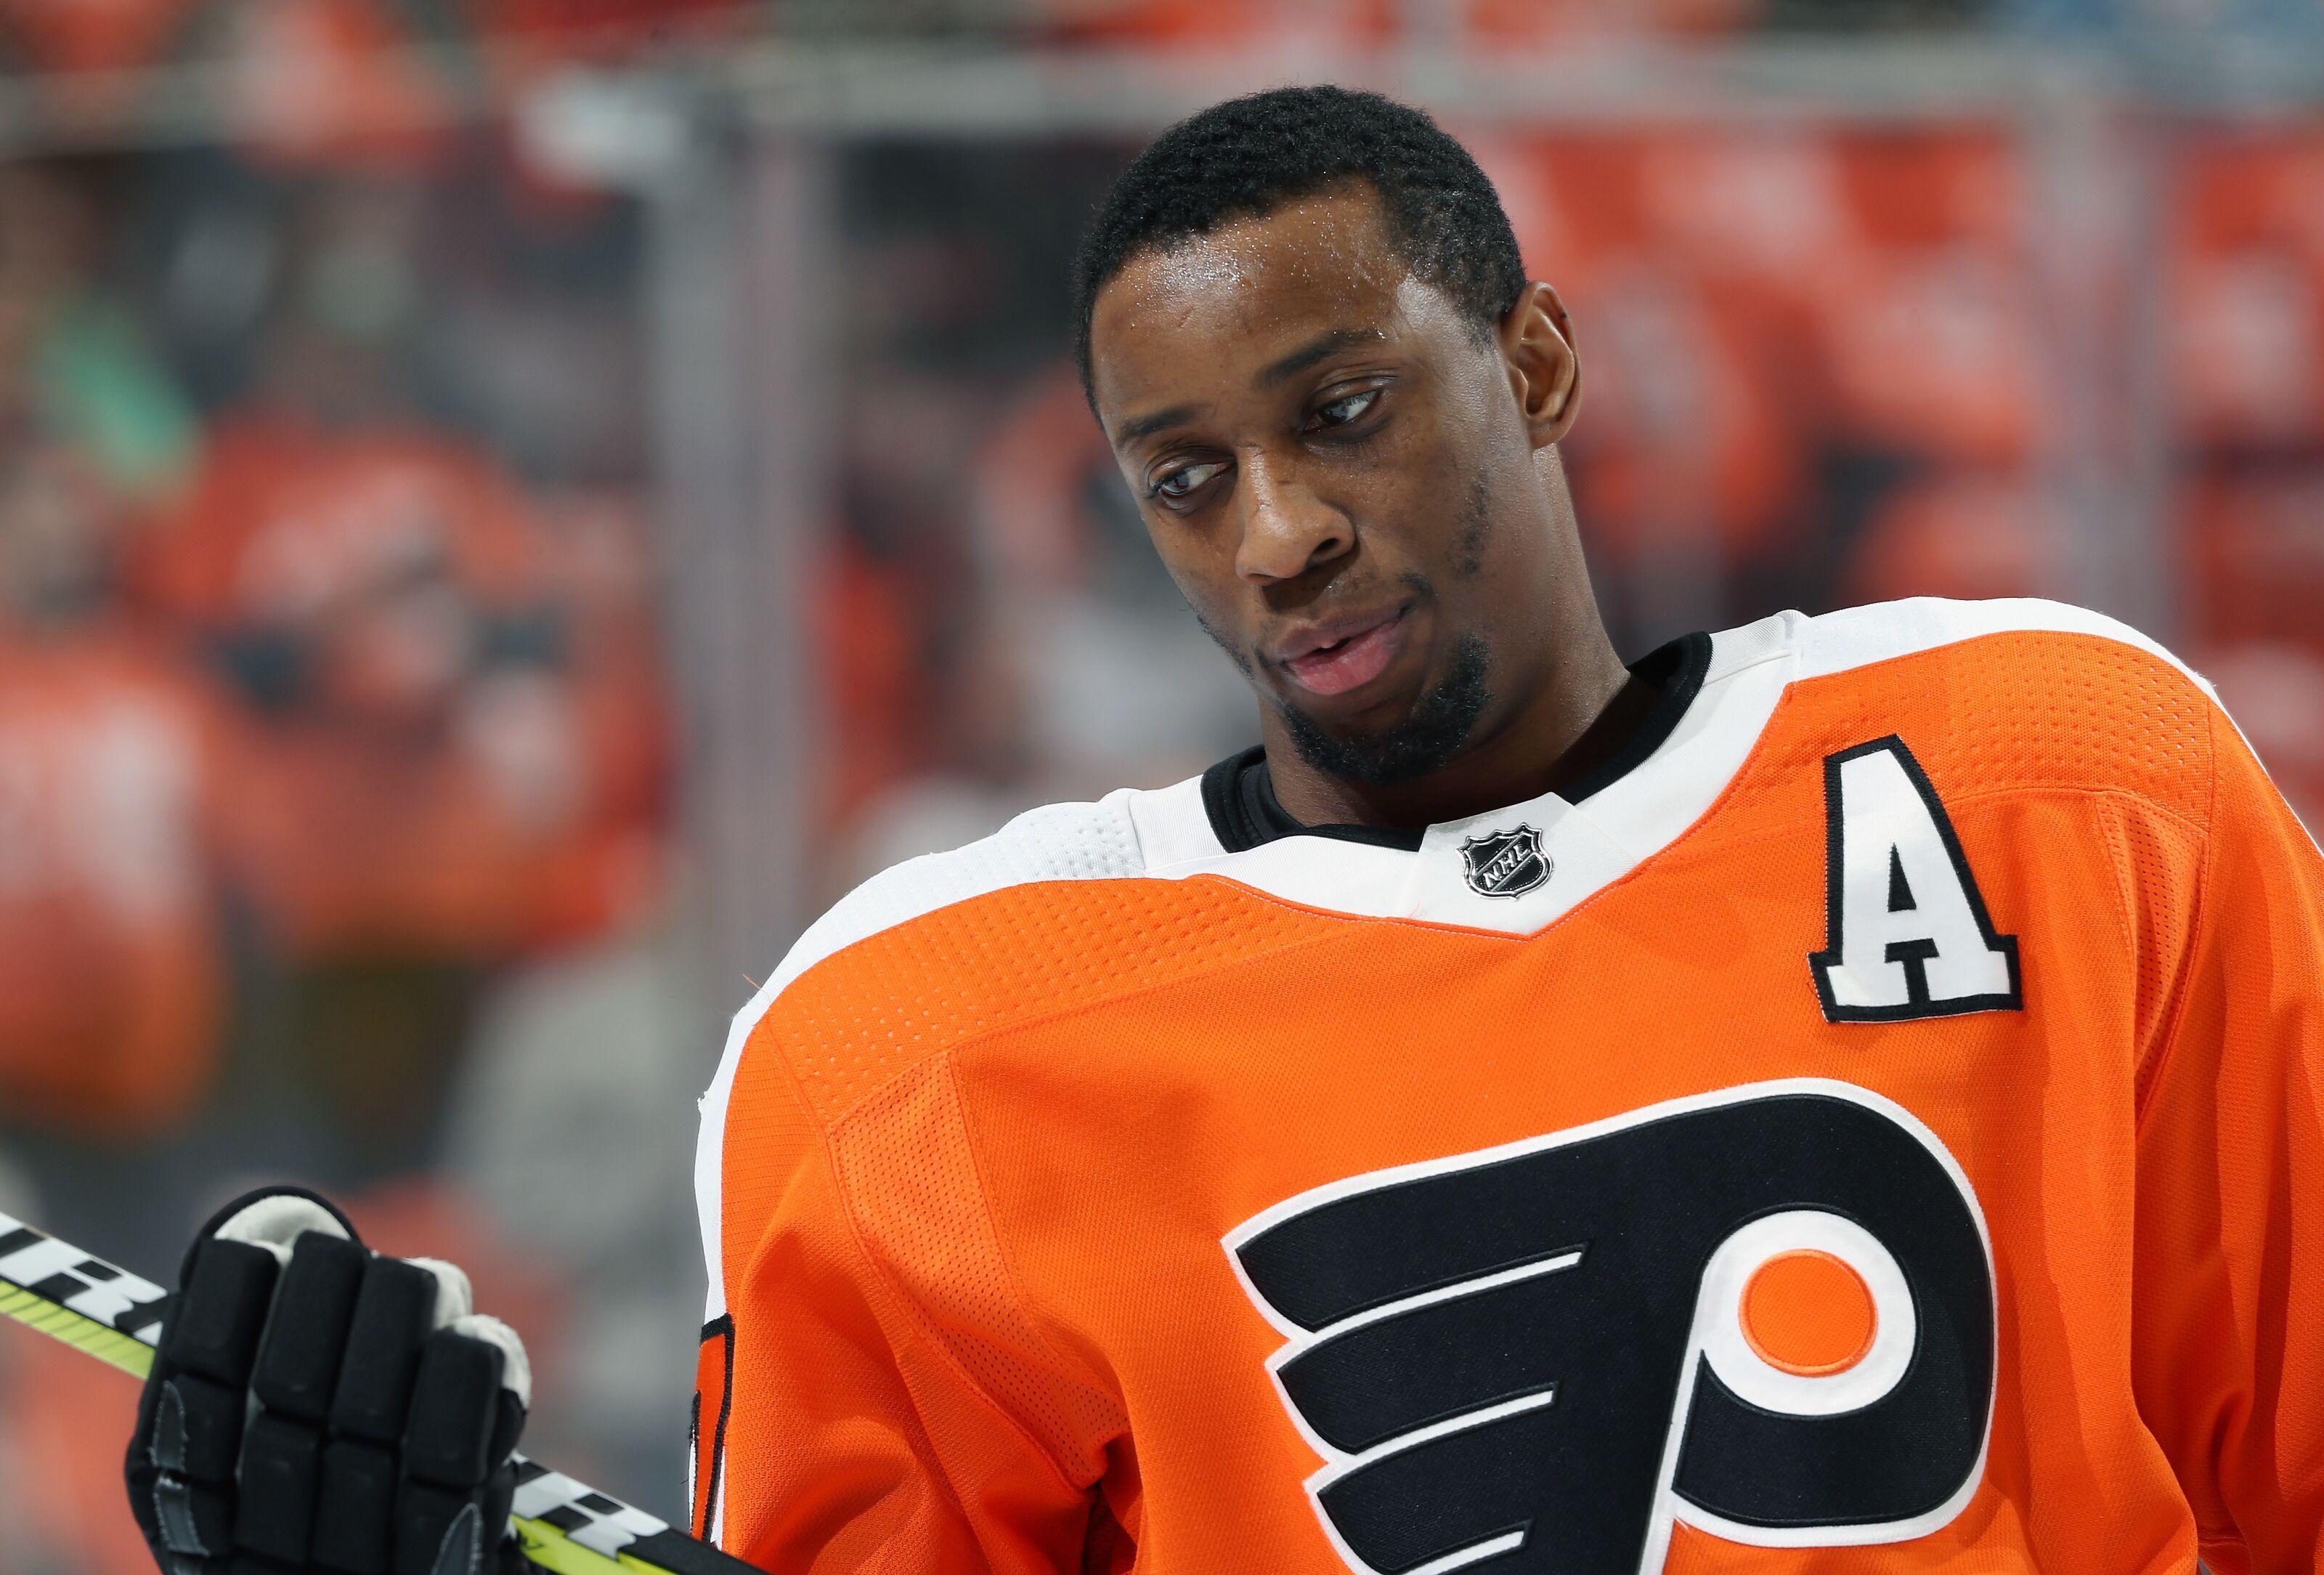 NHL Trade Rumors: 3 teams who should trade for Wayne Simmonds